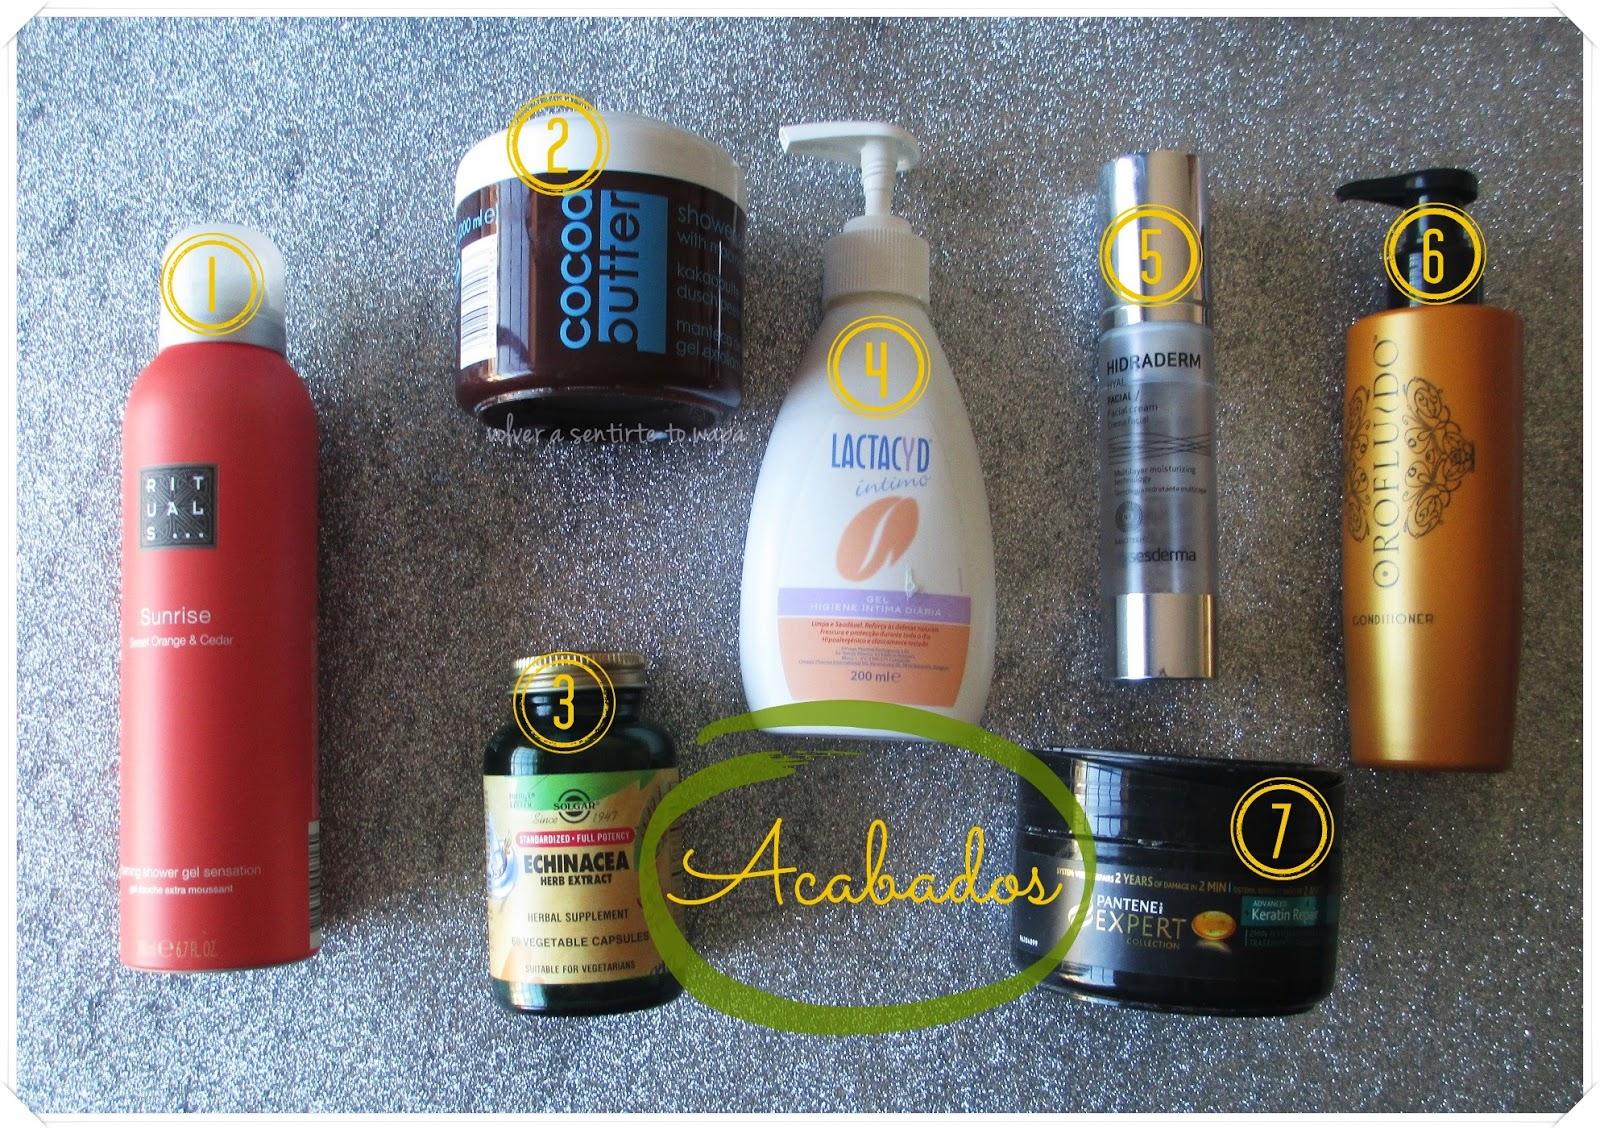 Productos de cosmética acabados en Febrero - Volver a Sentirte to Wapa